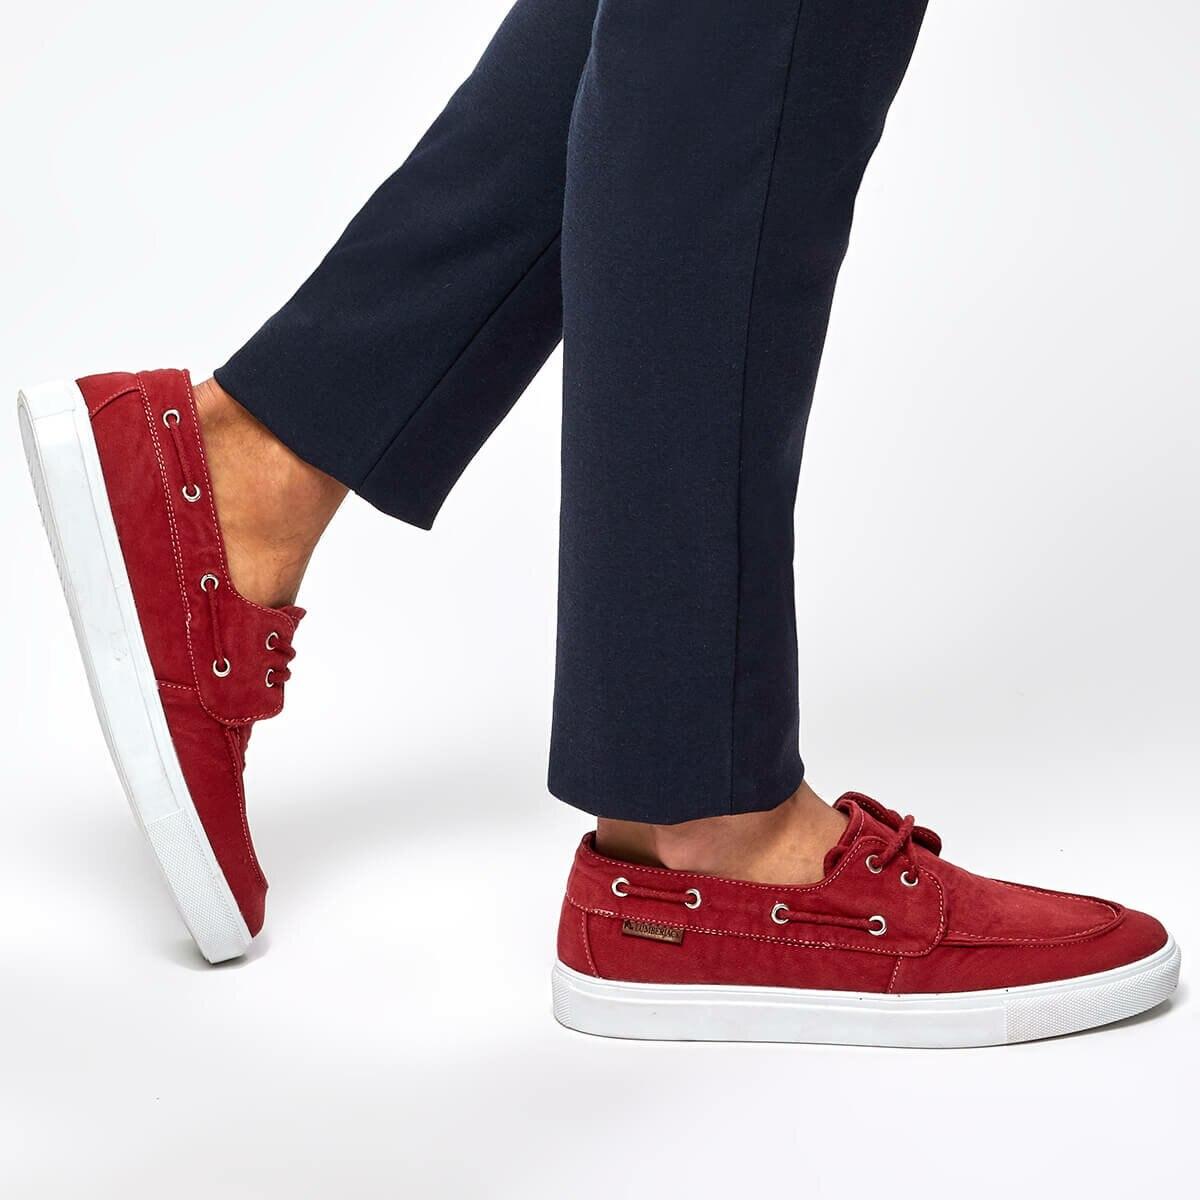 FLO DAYTONA zapatos de hombre rojos LUMBERJACK